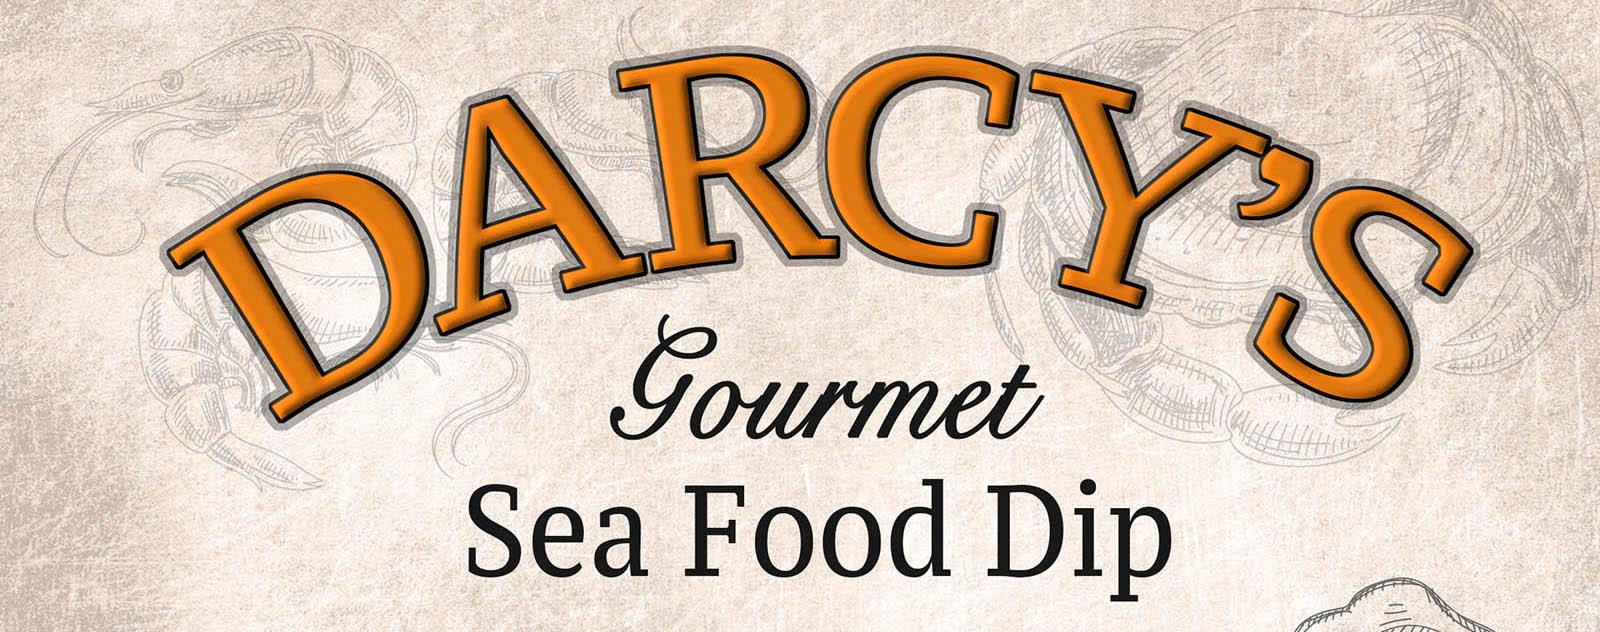 Darcy's Gourmet Sea Food Dip